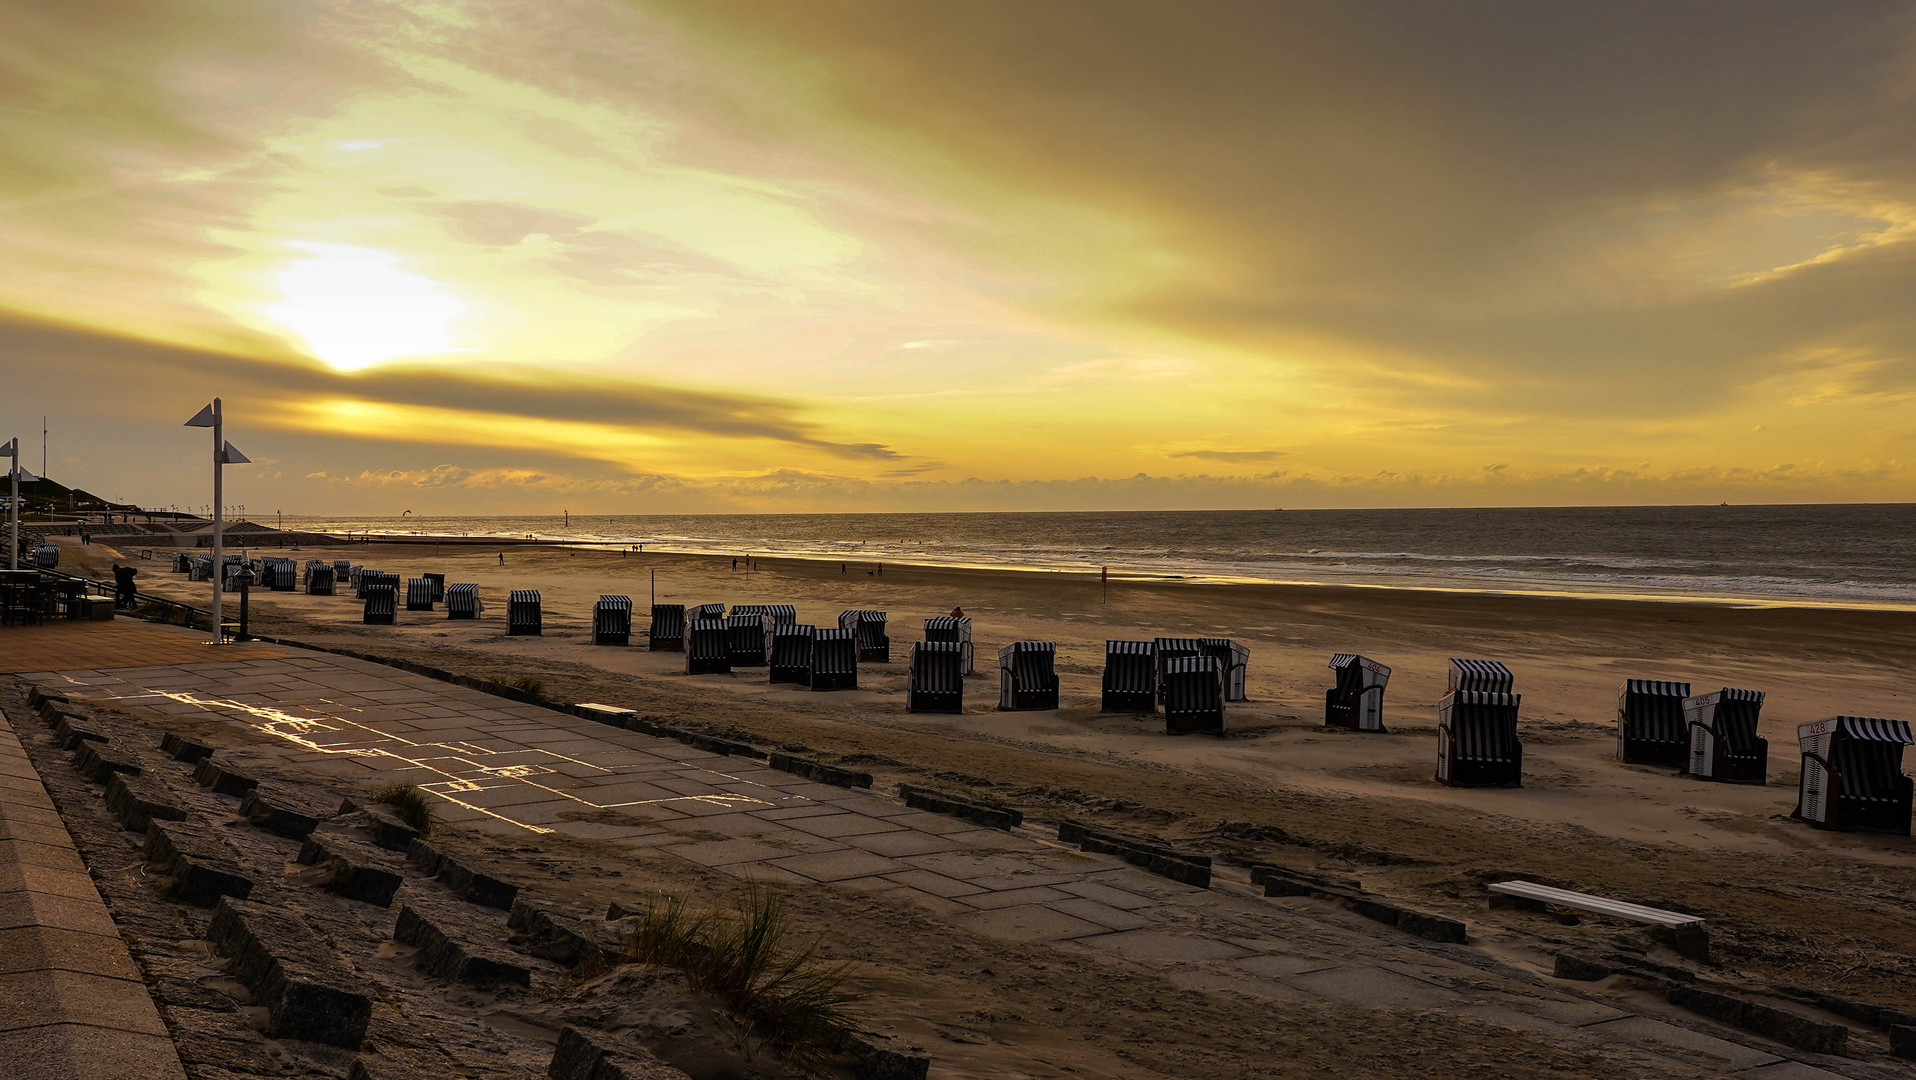 Am Strand 2